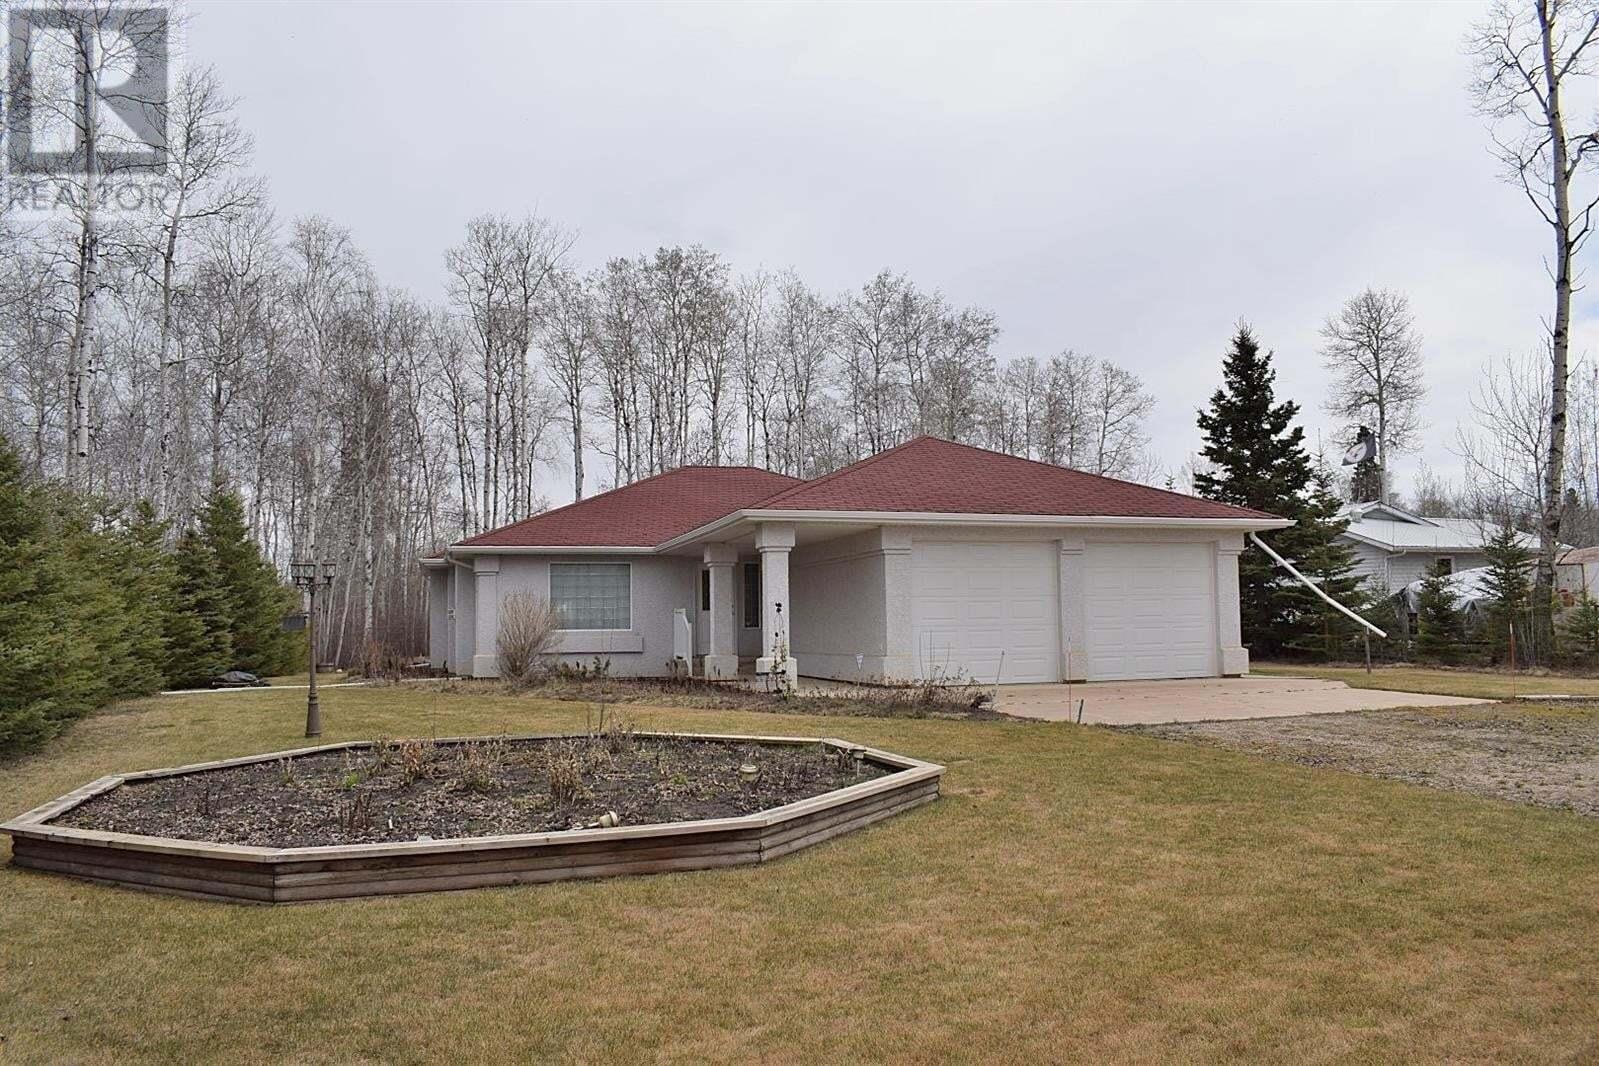 House for sale at 205 Cuelenaere Dr Emma Lake Saskatchewan - MLS: SK809246